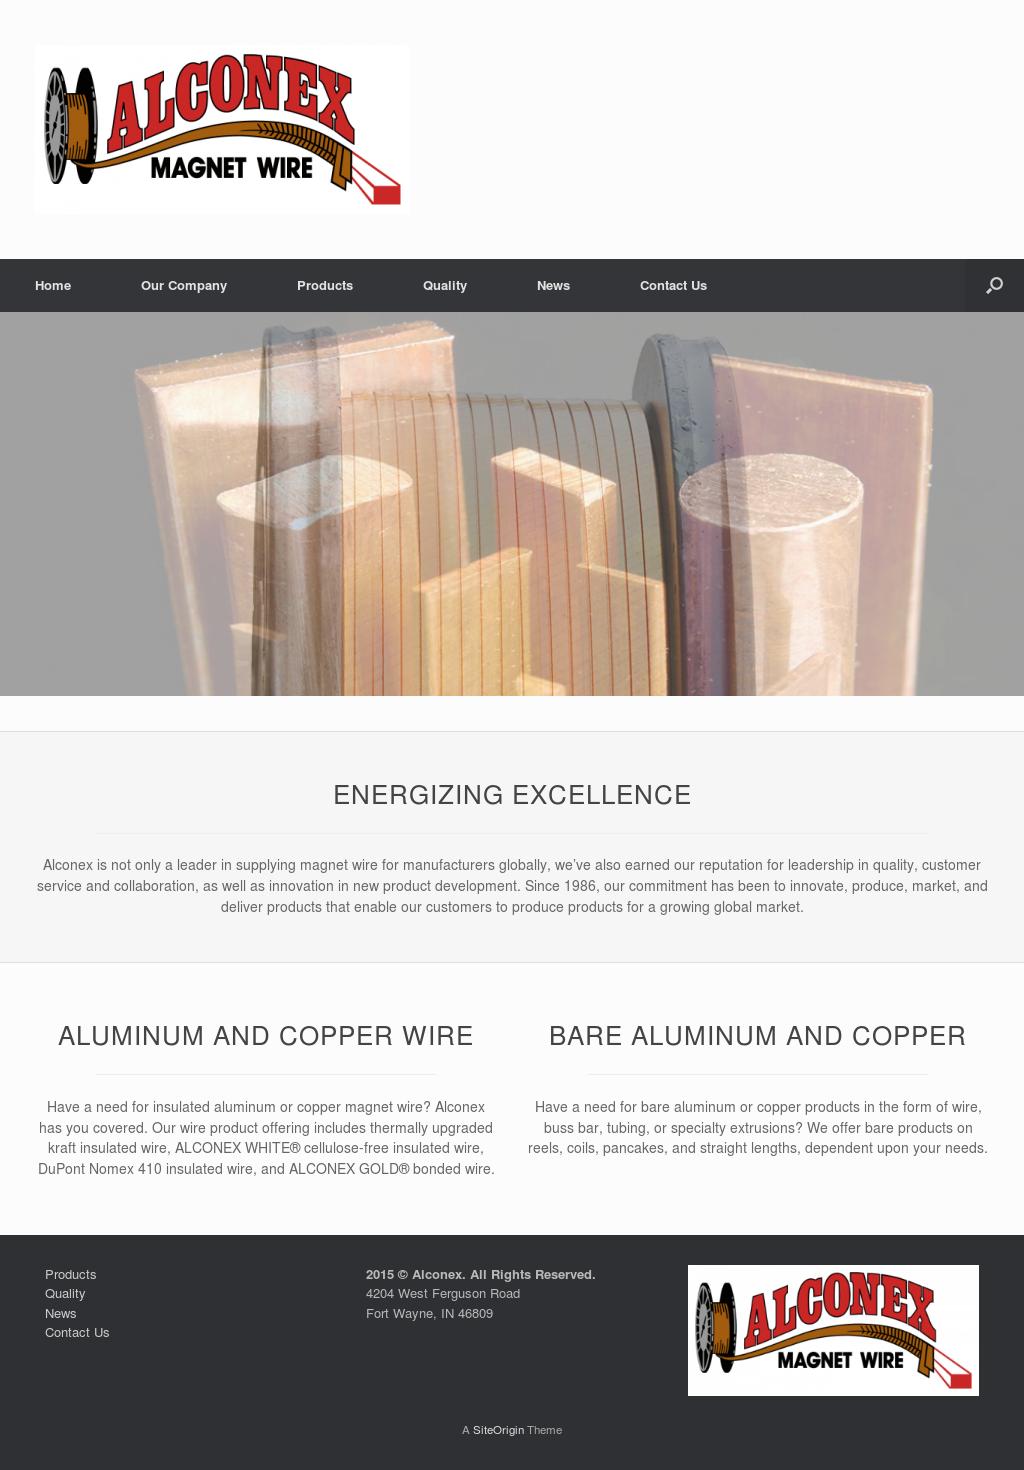 Alconex Competitors, Revenue and Employees - Owler Company Profile